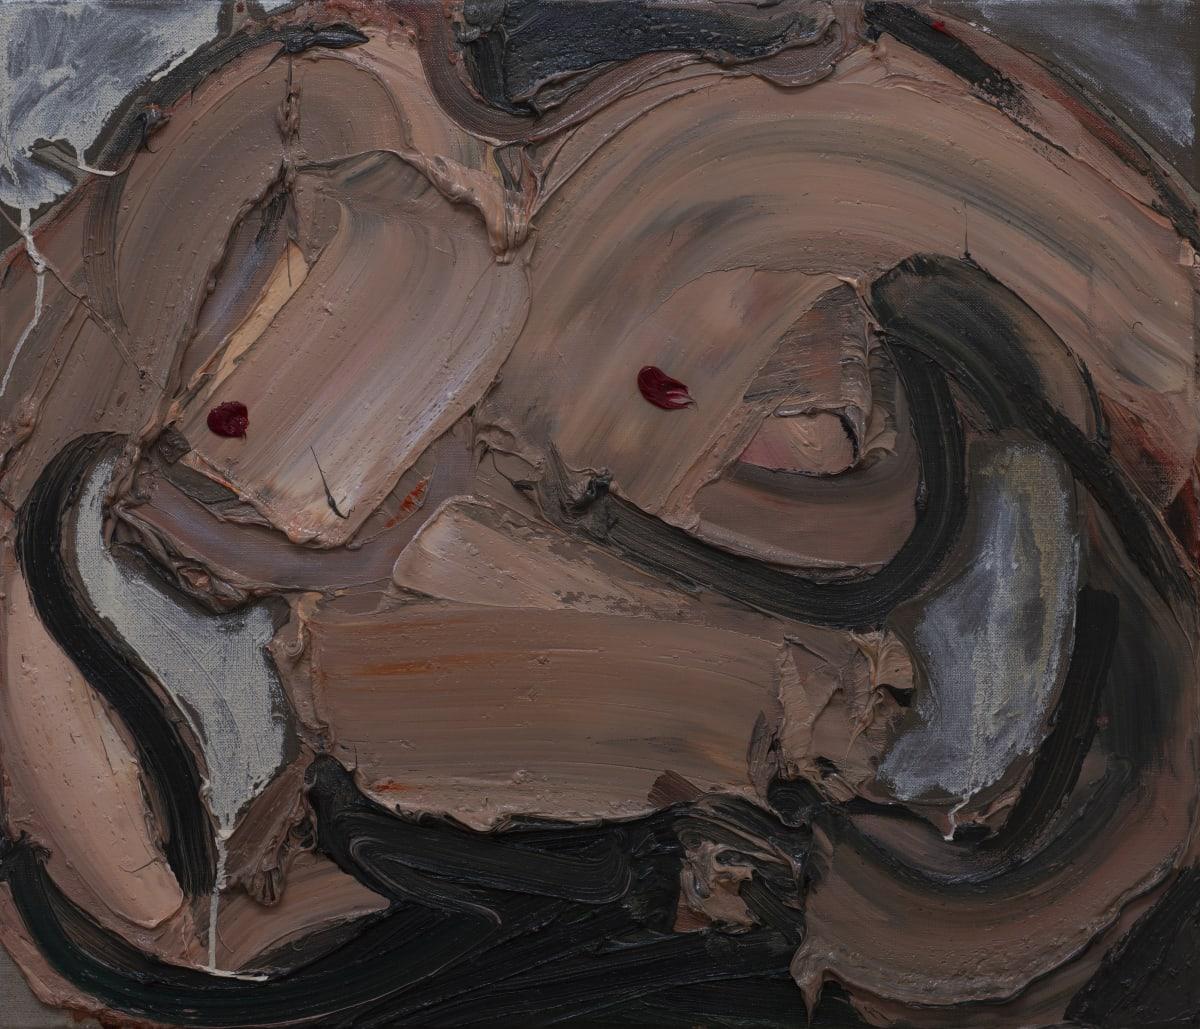 Toby Raine, Janie's Breasts, 2019